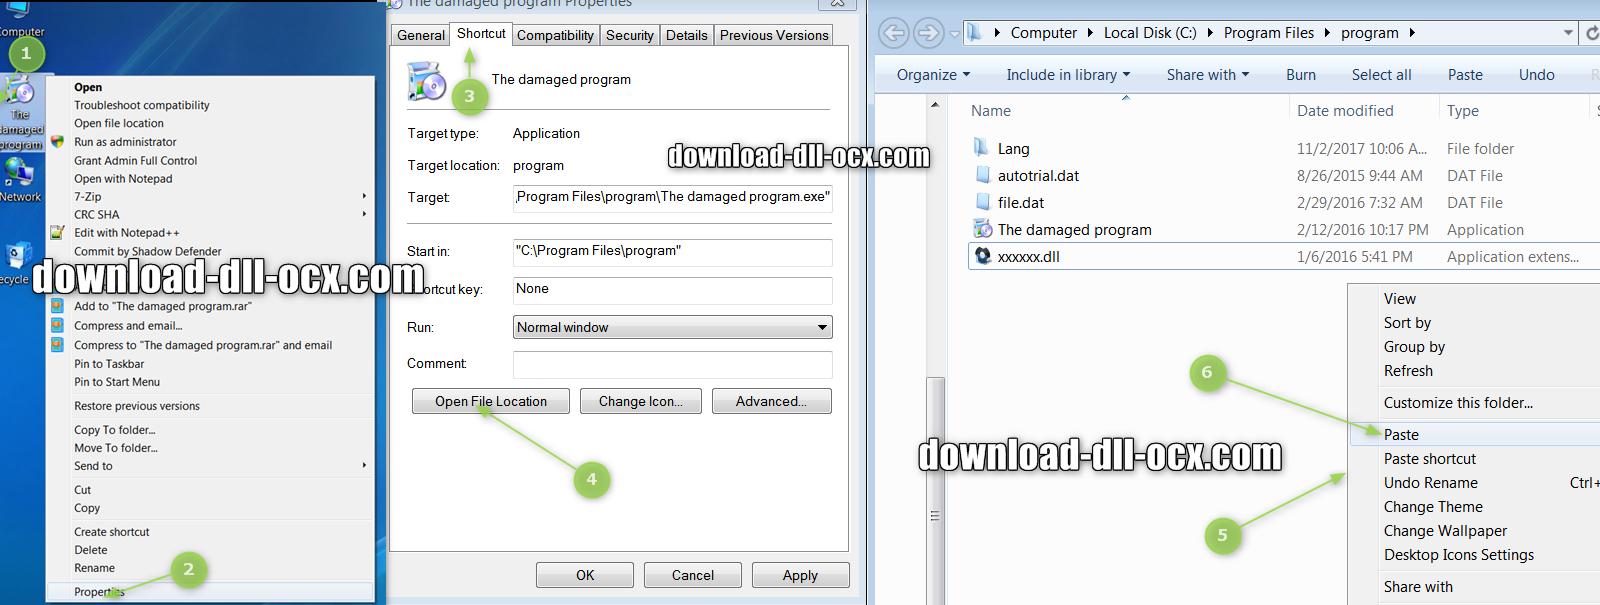 how to install ssldivx.dll file? for fix missing